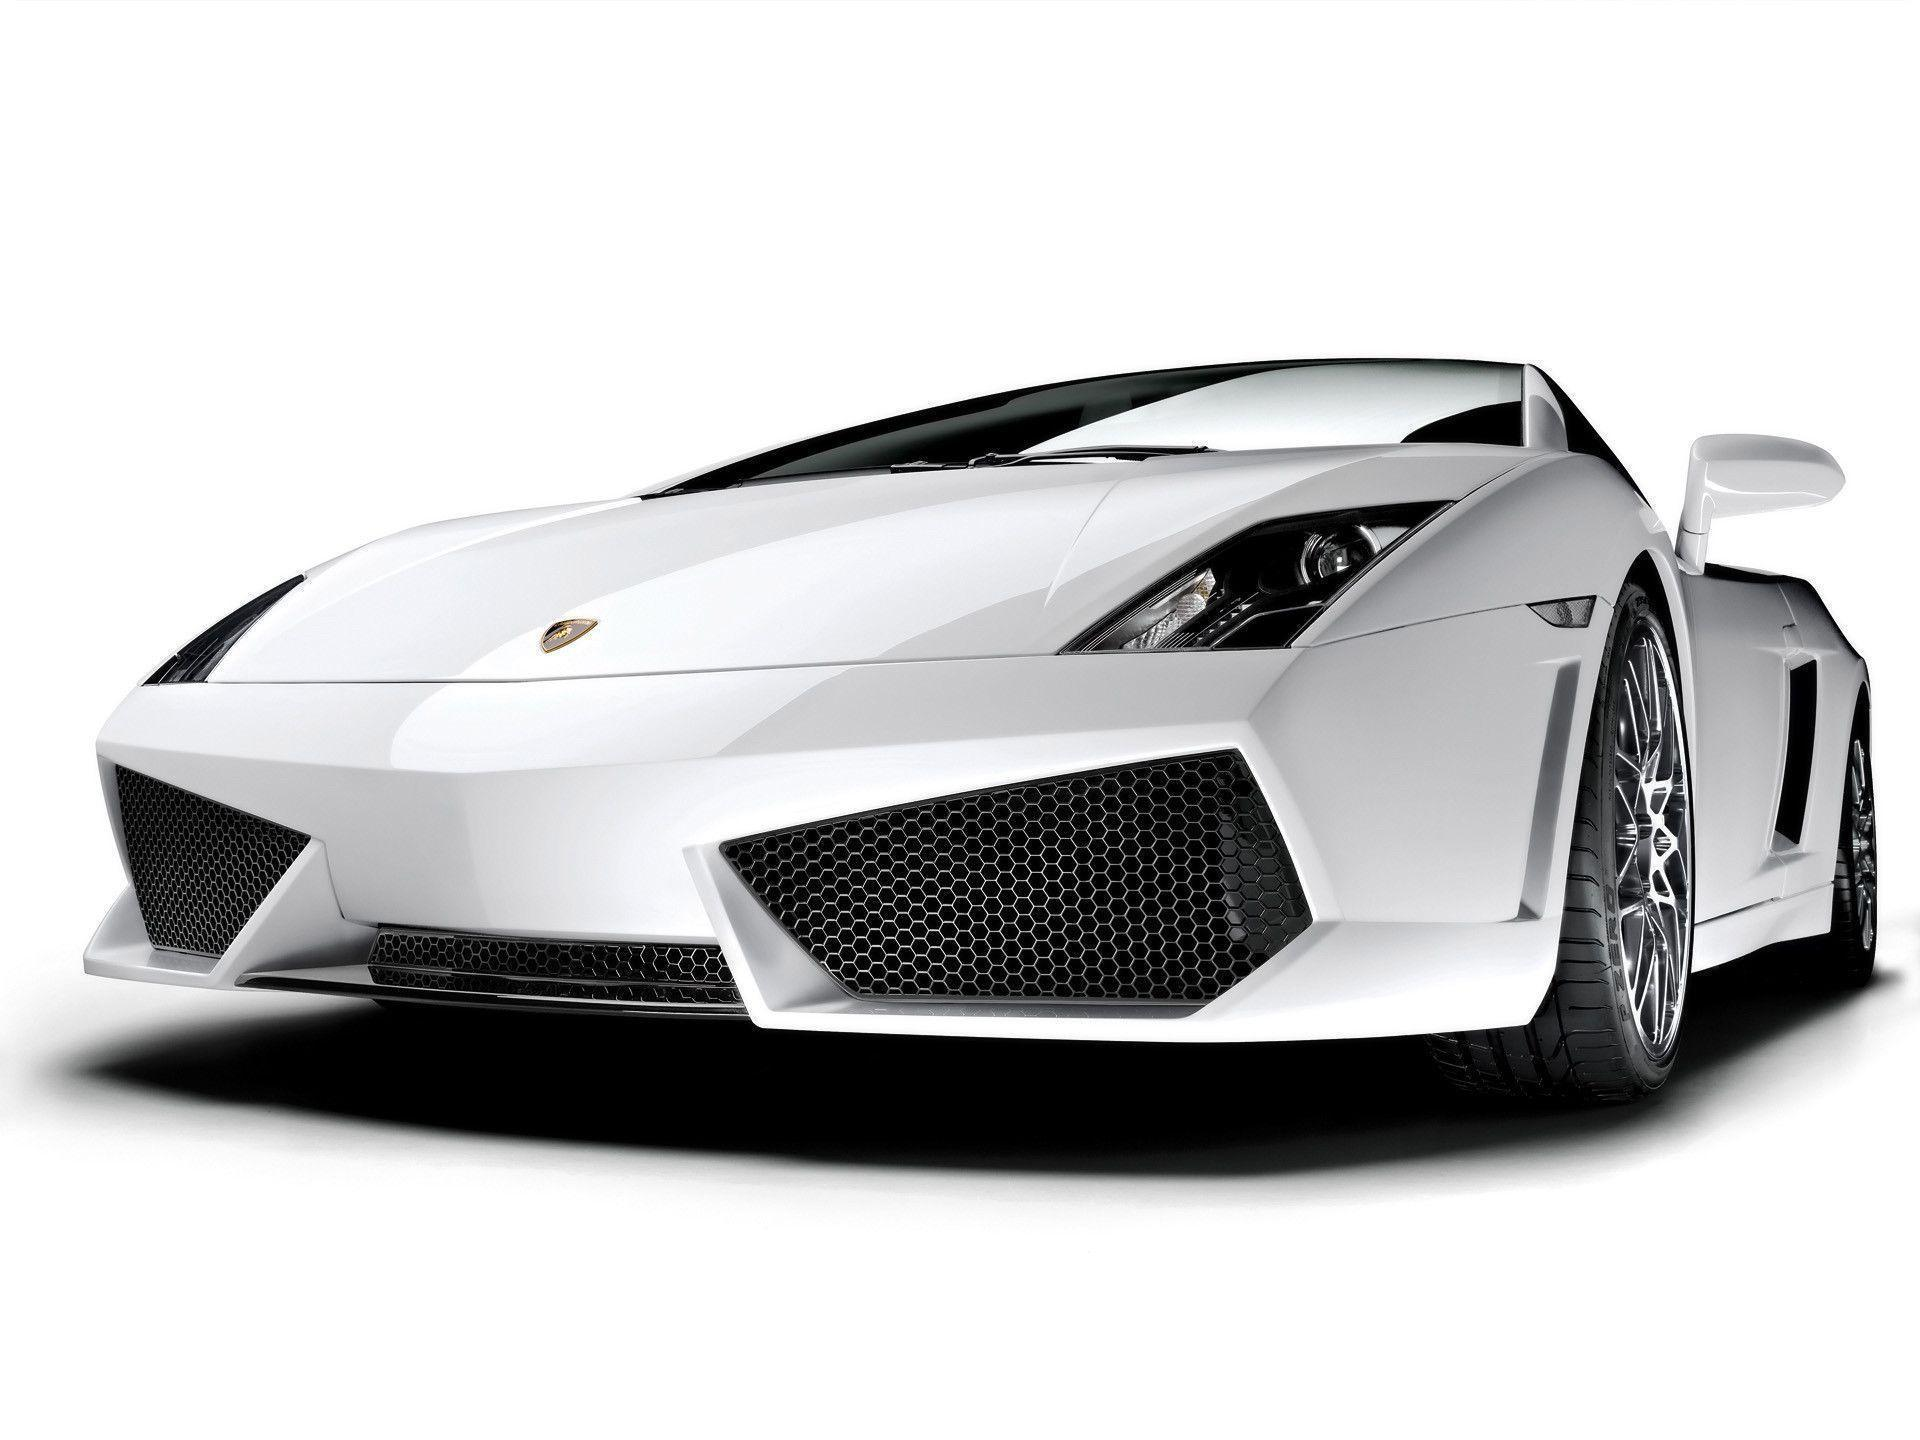 White Lamborghini Gallardo Wallpapers - Wallpaper CaveLamborghini Wallpaper White